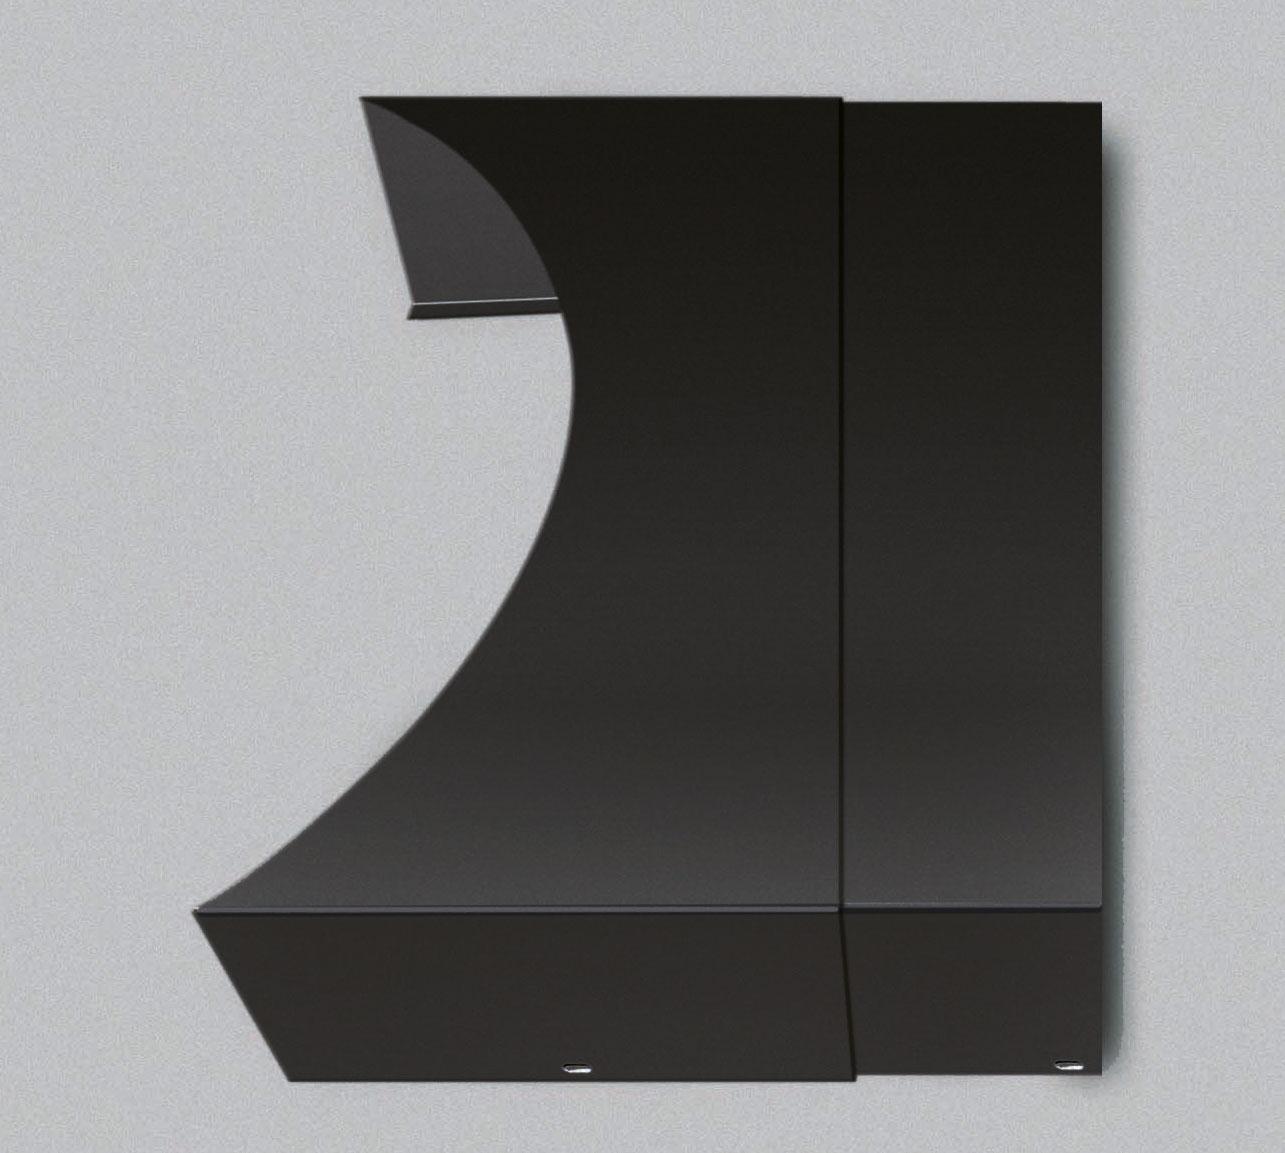 Oranier Teleskop-Abdeckung Aquacover für Arena Aqua Stahl schwarz Bild 1